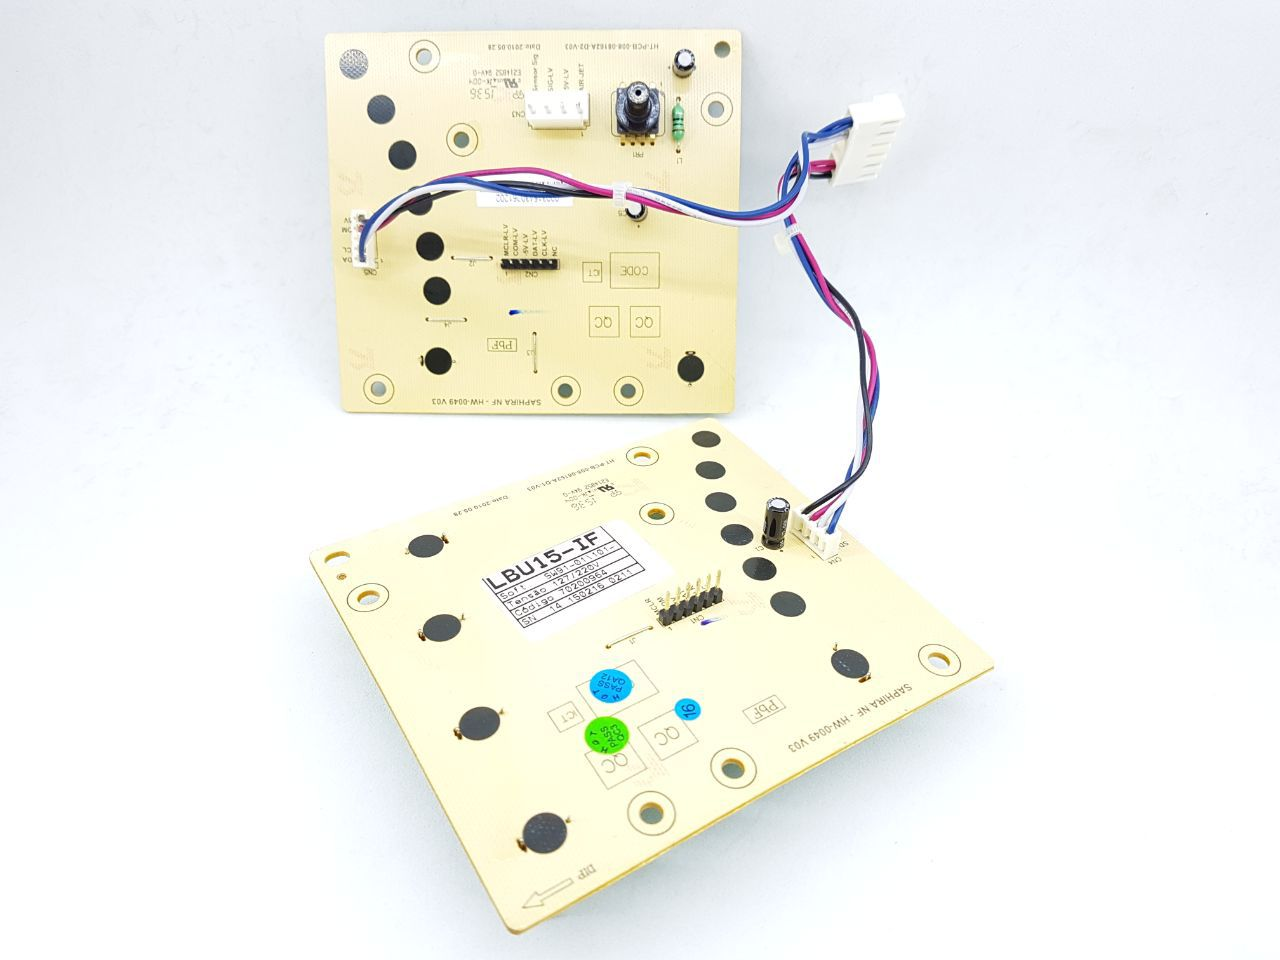 Placa Interface Pressostato Electrolux Orig. Lbu15 70200964